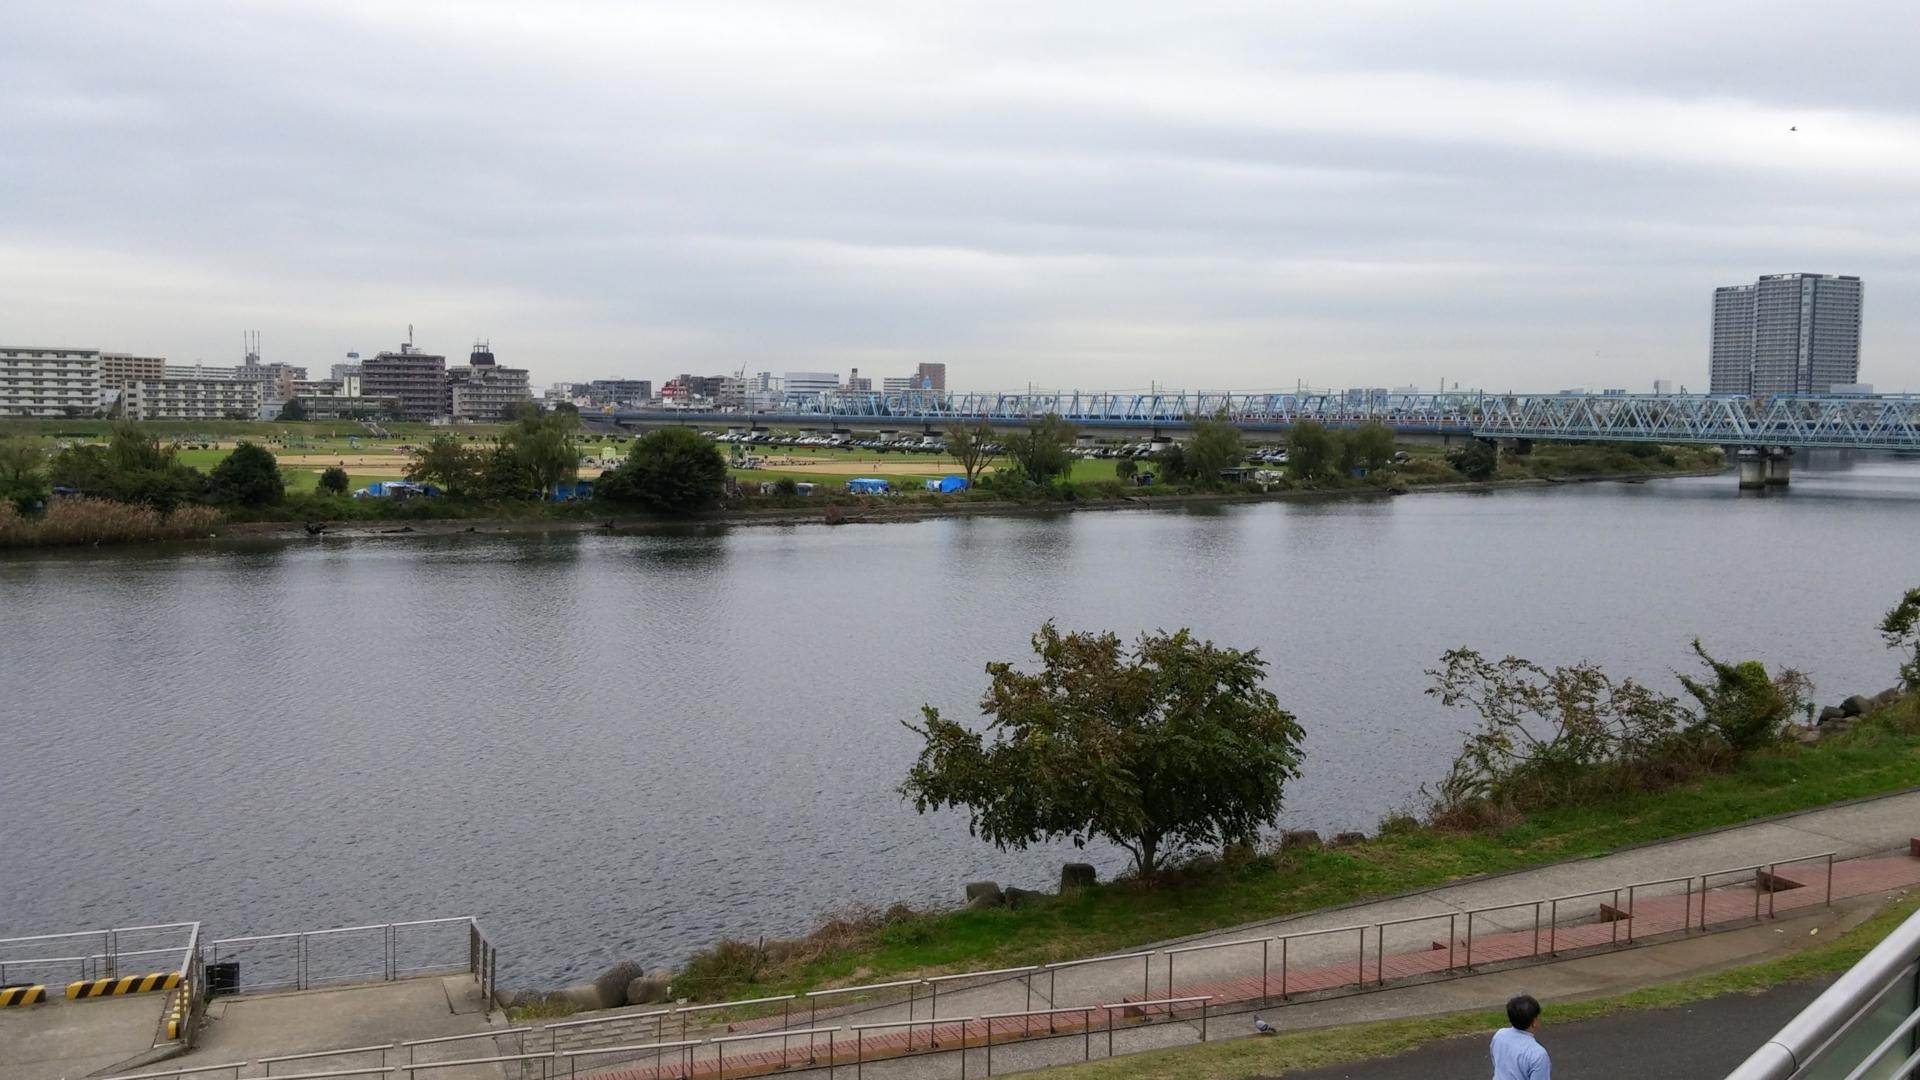 f:id:ToshUeno:20141108104932j:plain